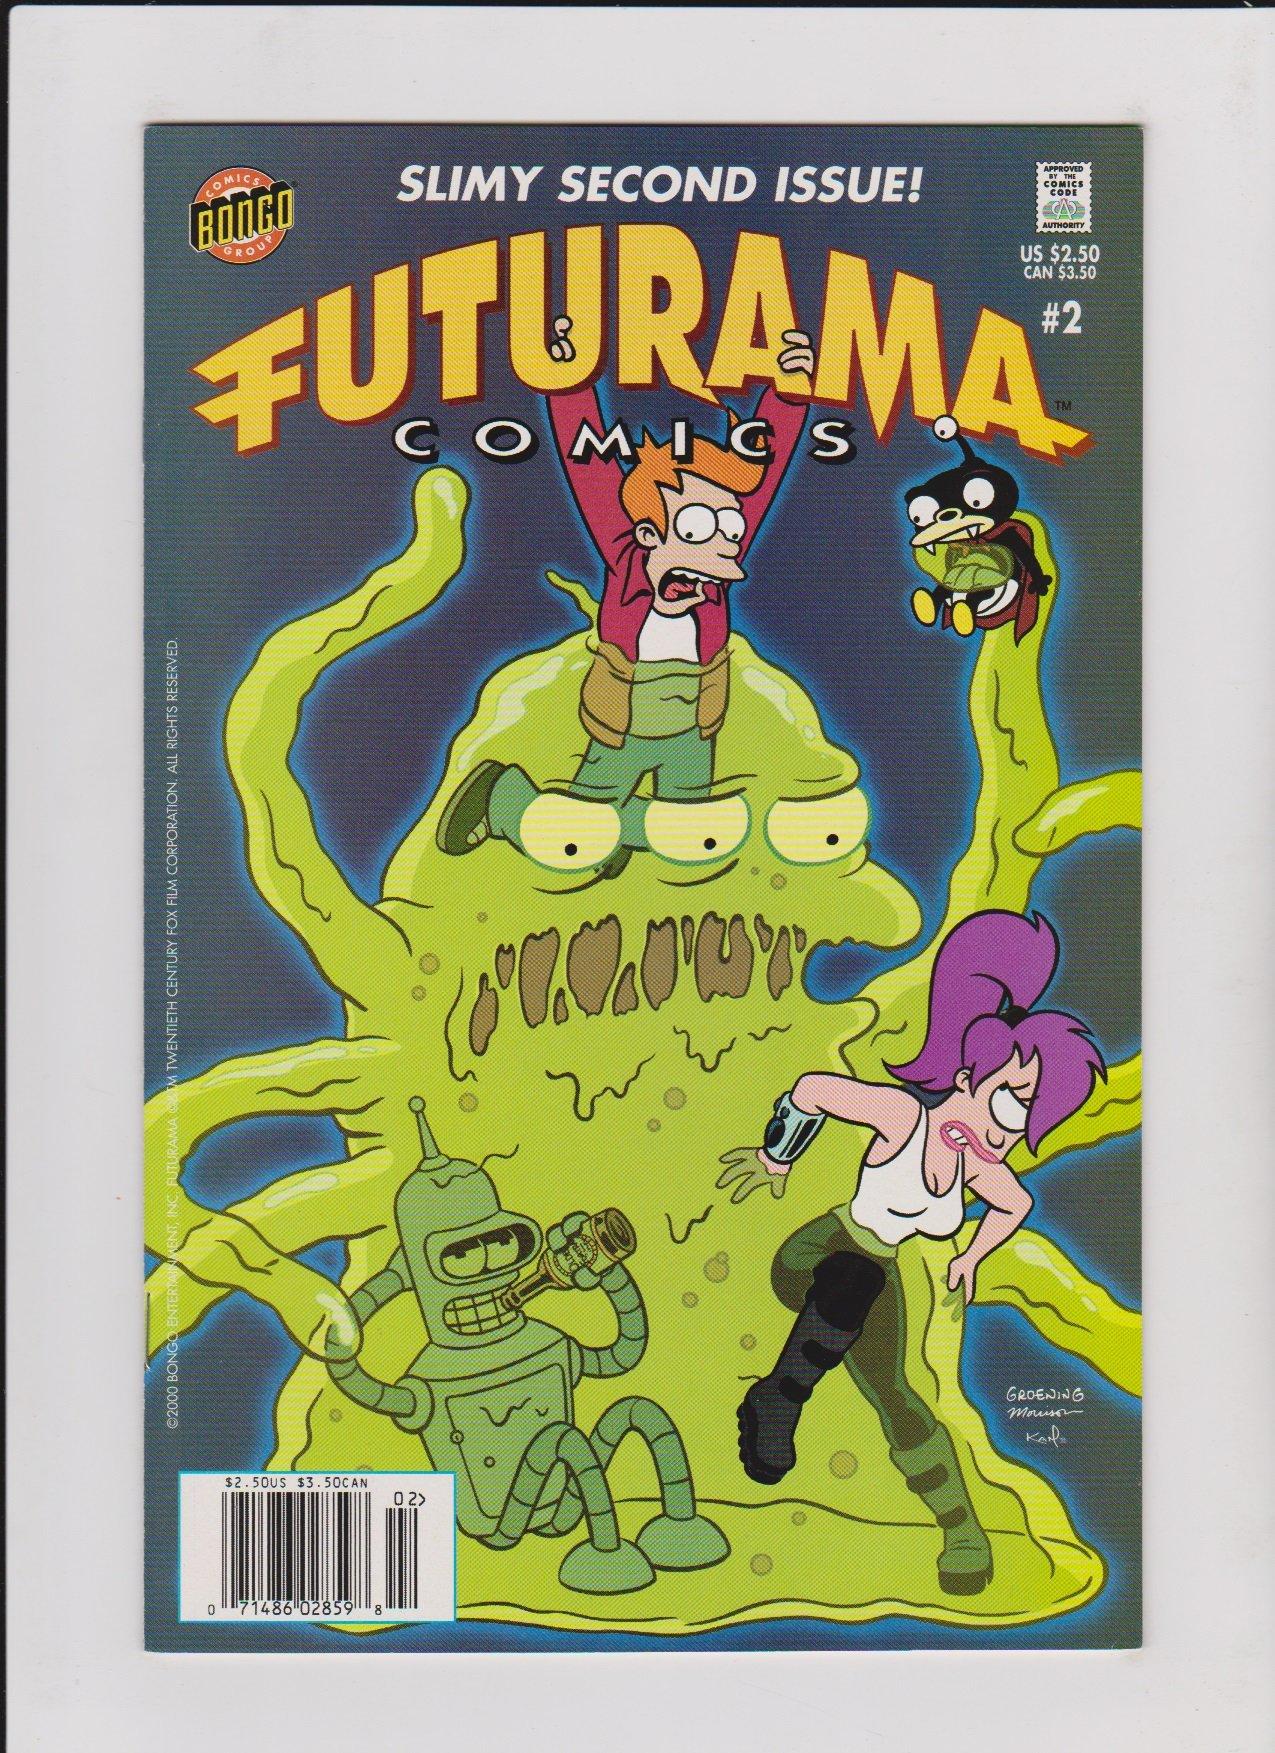 FUTURAMA COMICS #2: Amazon.es: Groening, Matt: Libros